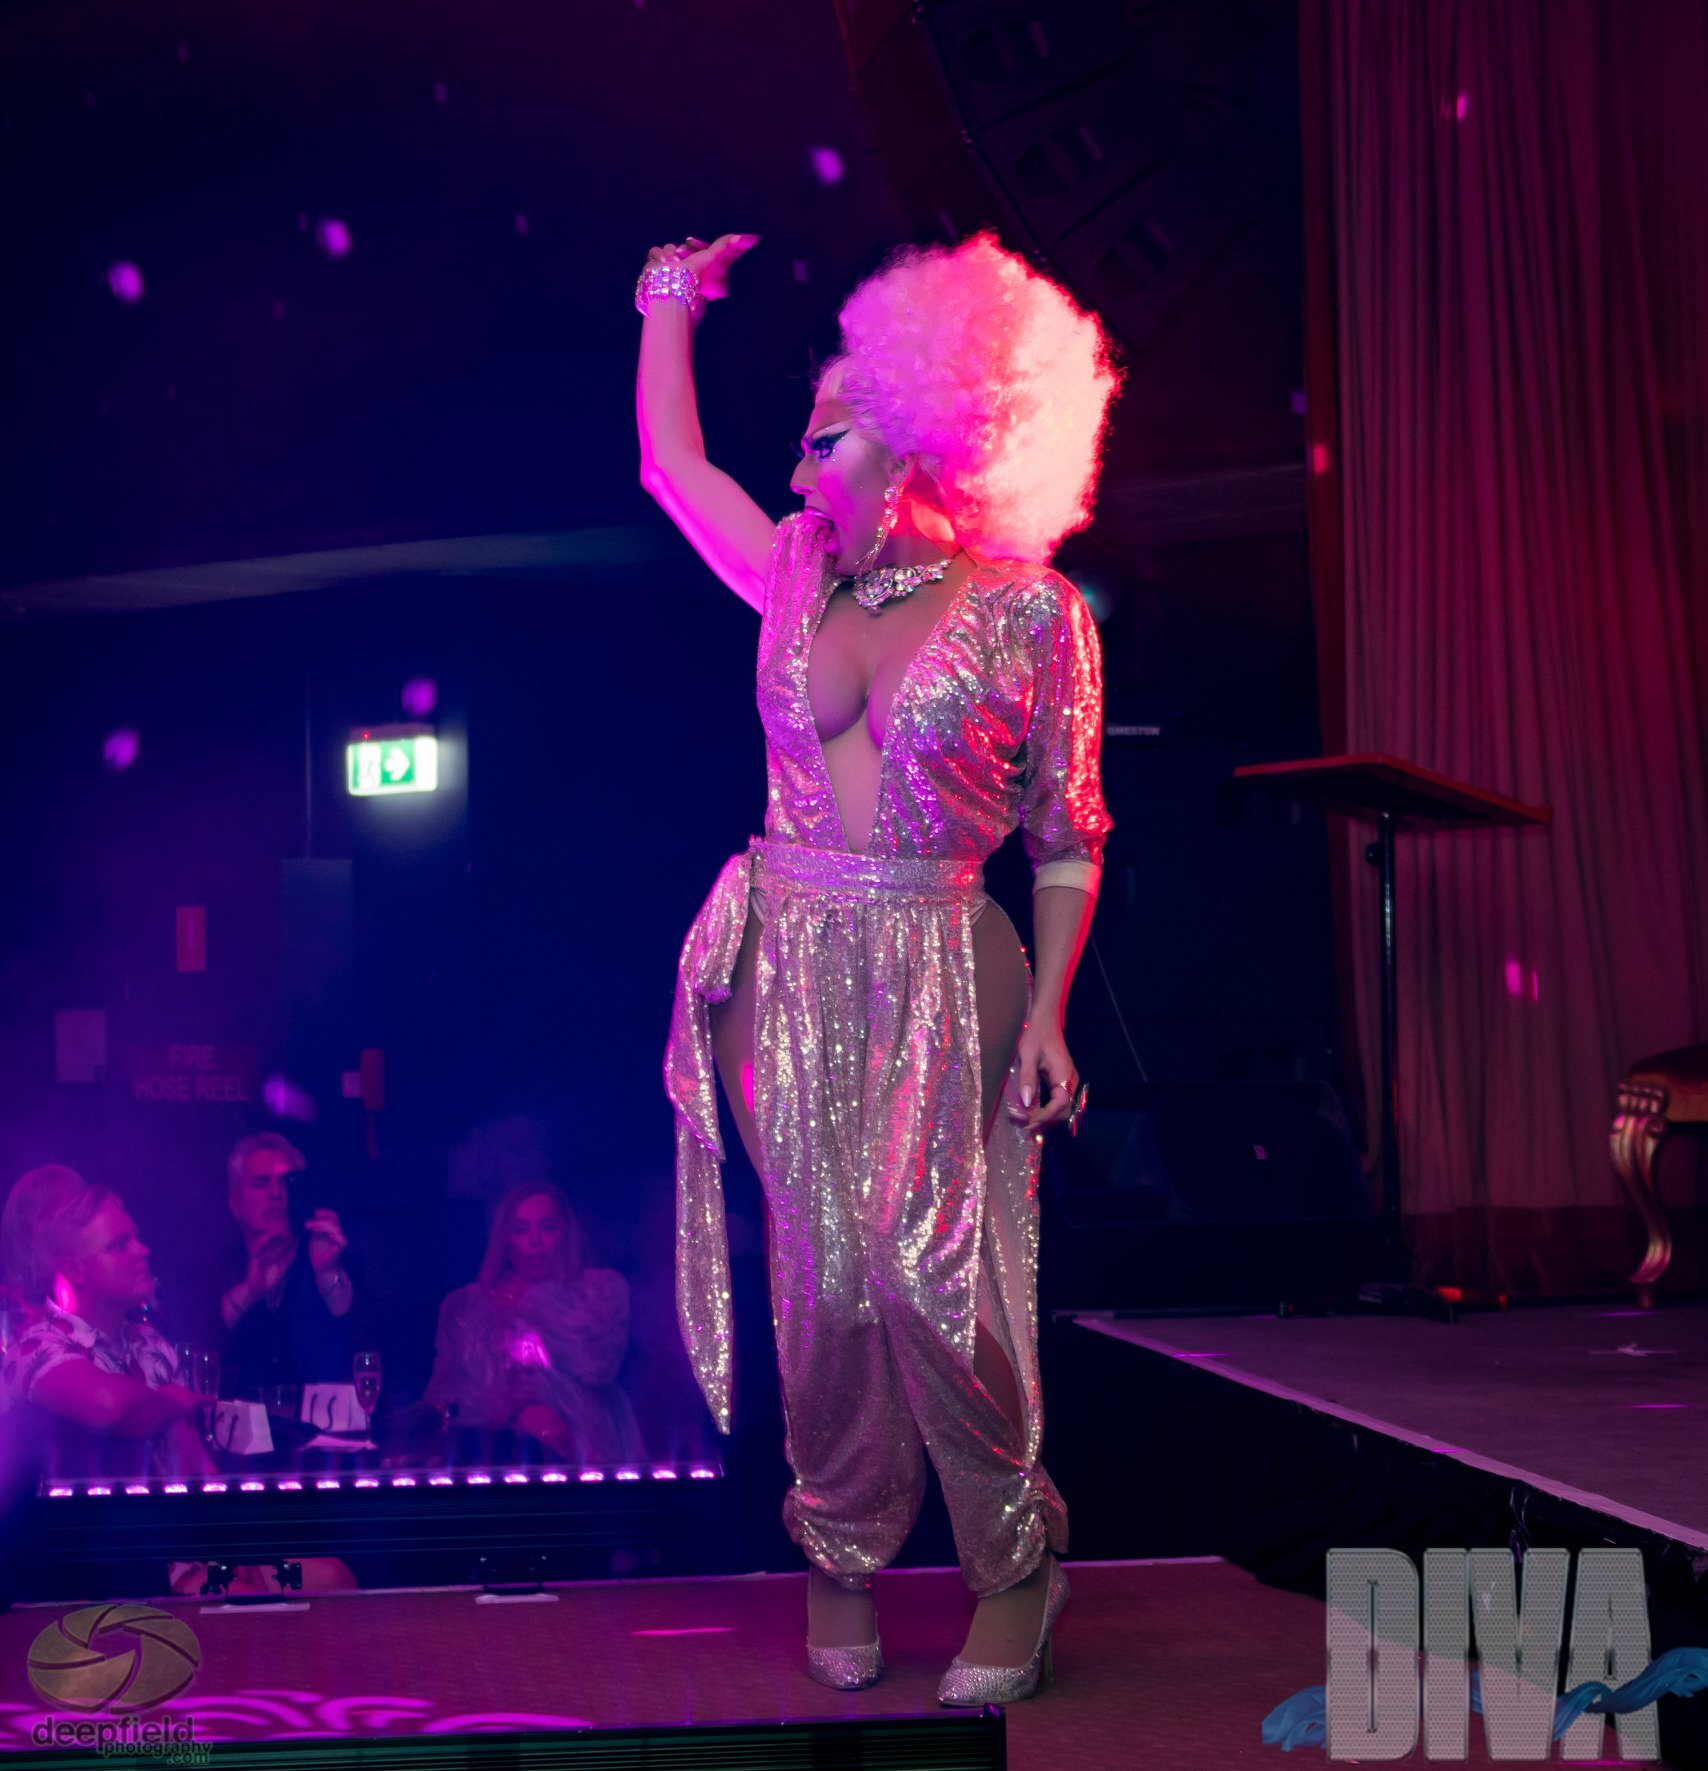 decoda-secret-disco-performance-performing-sickening-diva-awards-sydney-drag-queen-royalty-best-hire-drag-race-australia.jpg